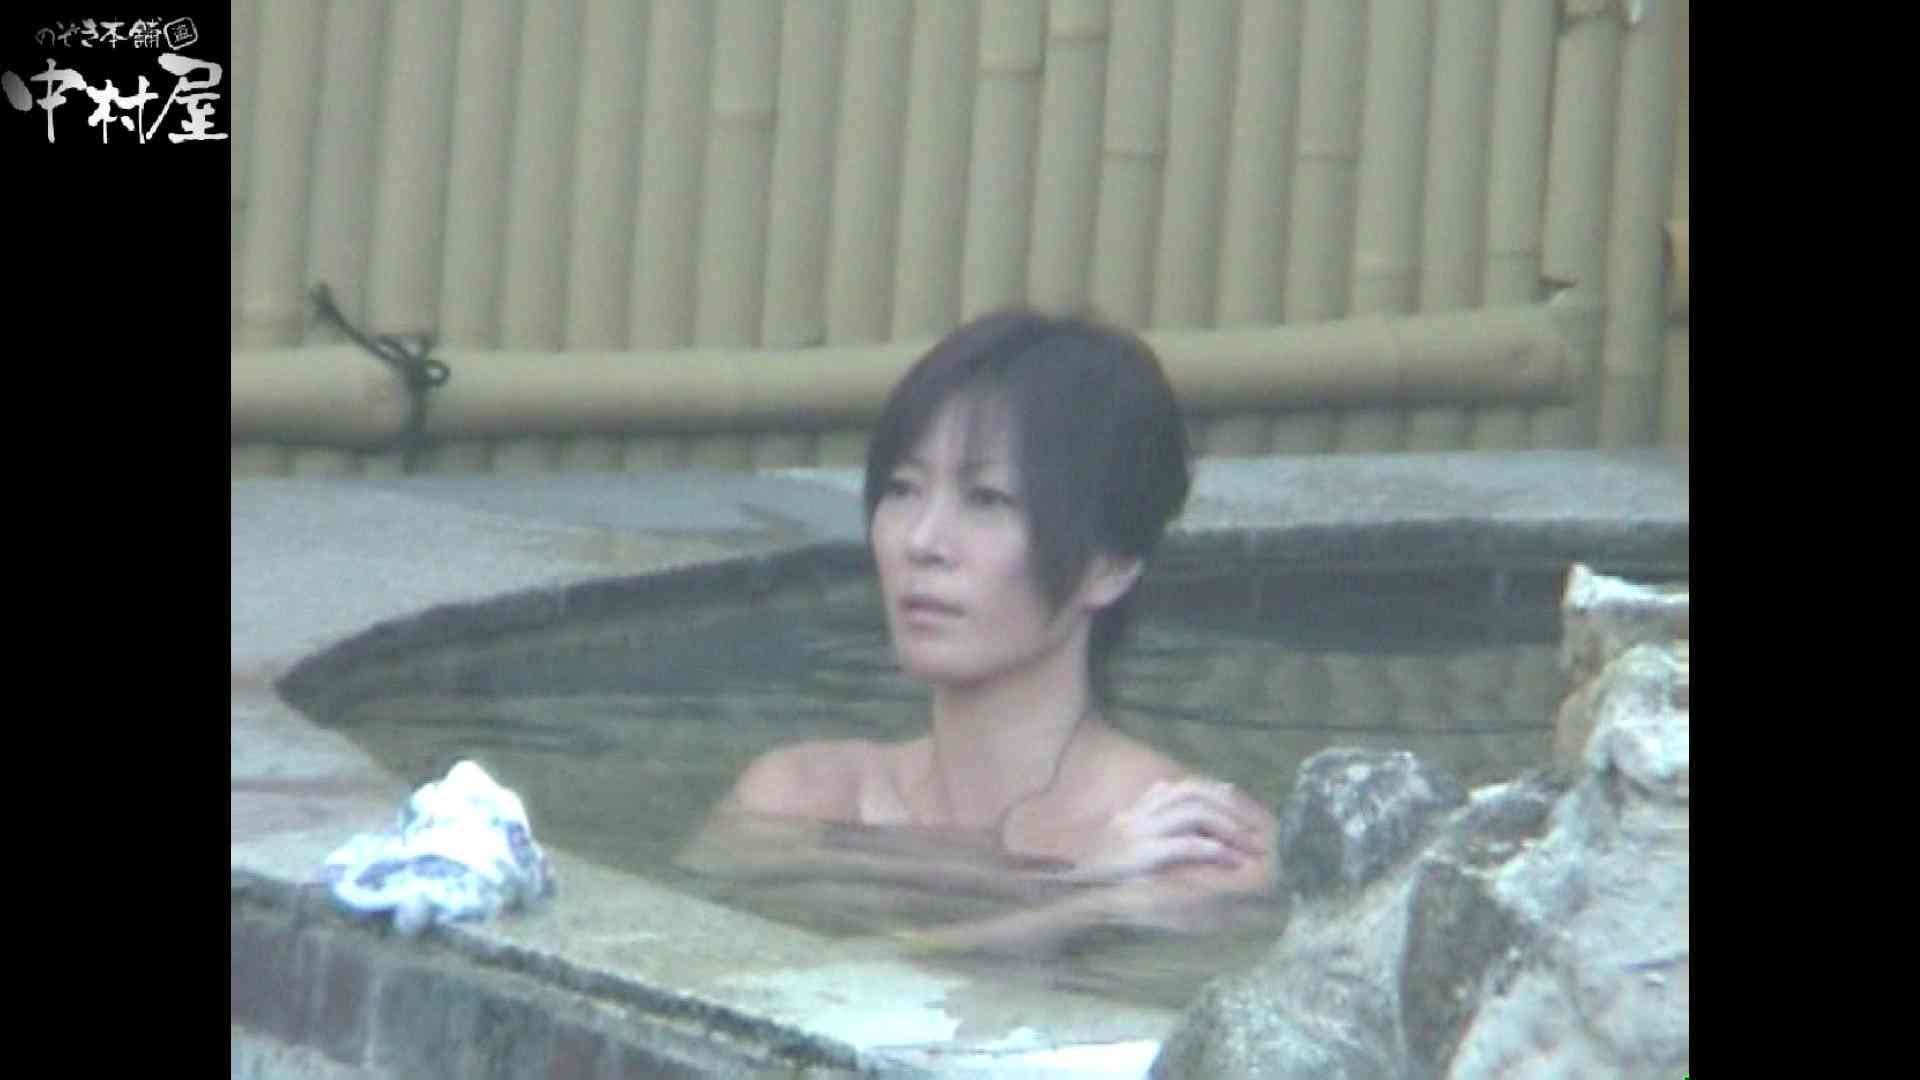 Aquaな露天風呂Vol.972 露天   OLセックス  80画像 58